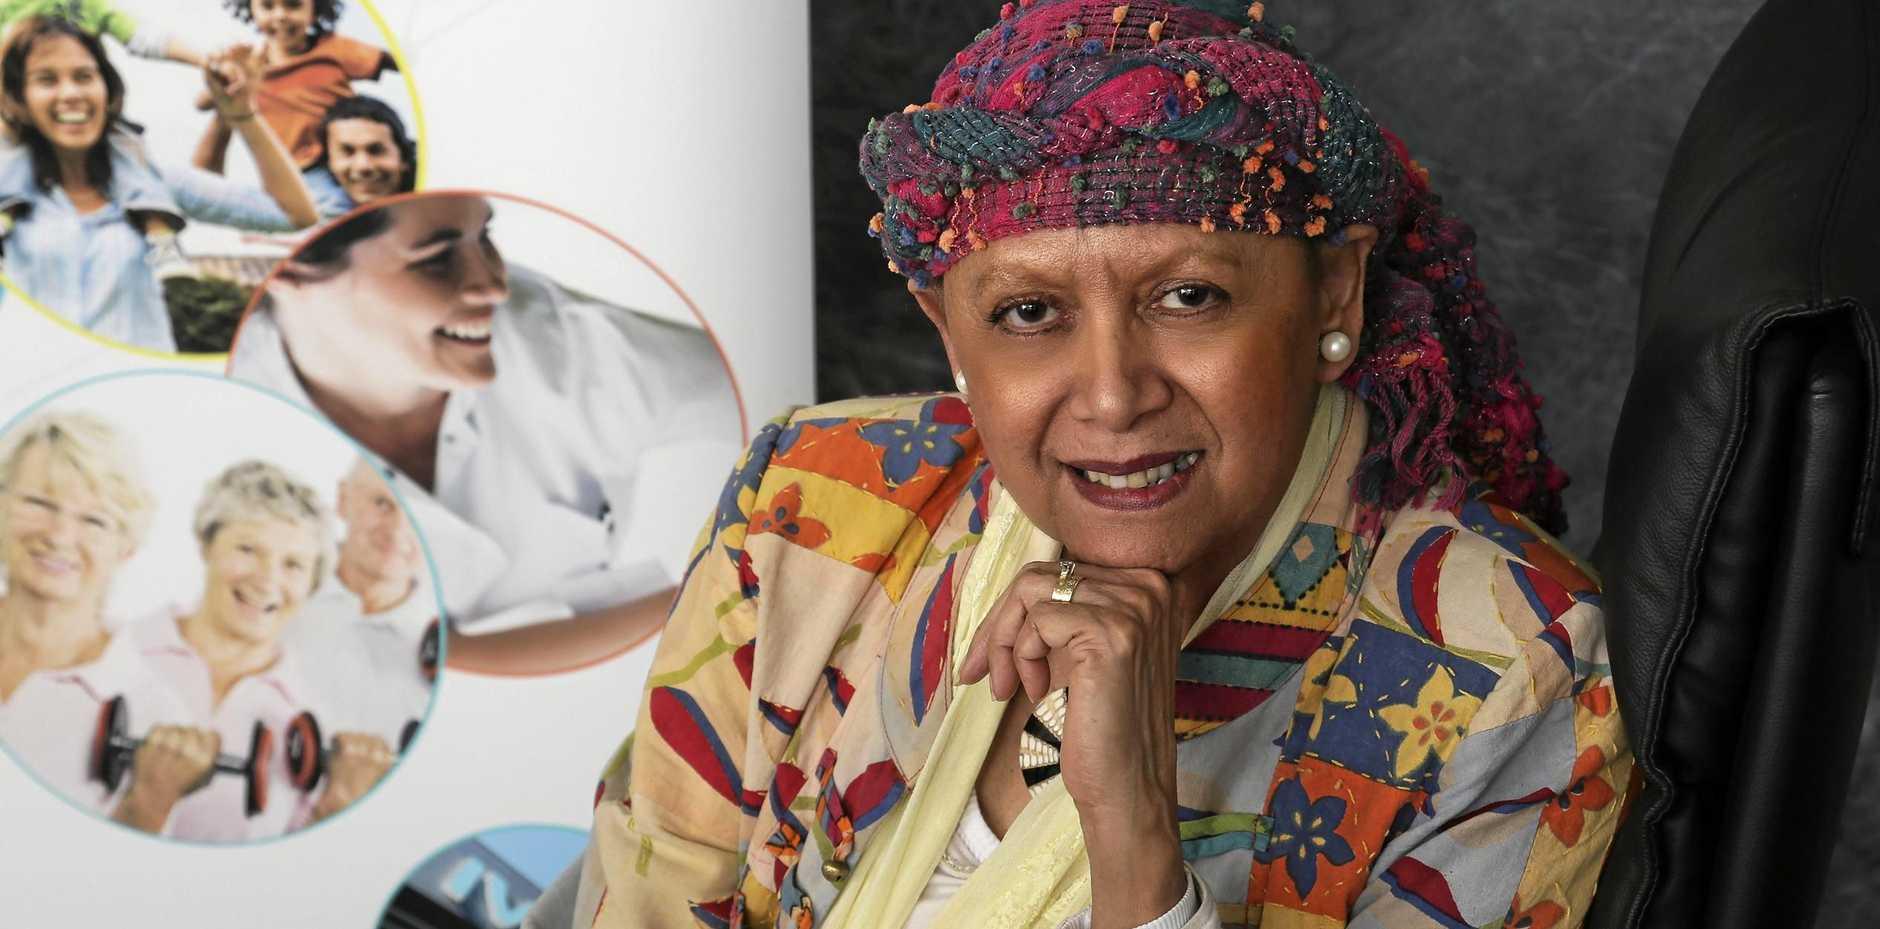 VISION: Aunty Cheri Yavu-Kama-Harathunian has spoken about the pathway forward for reconcilation.